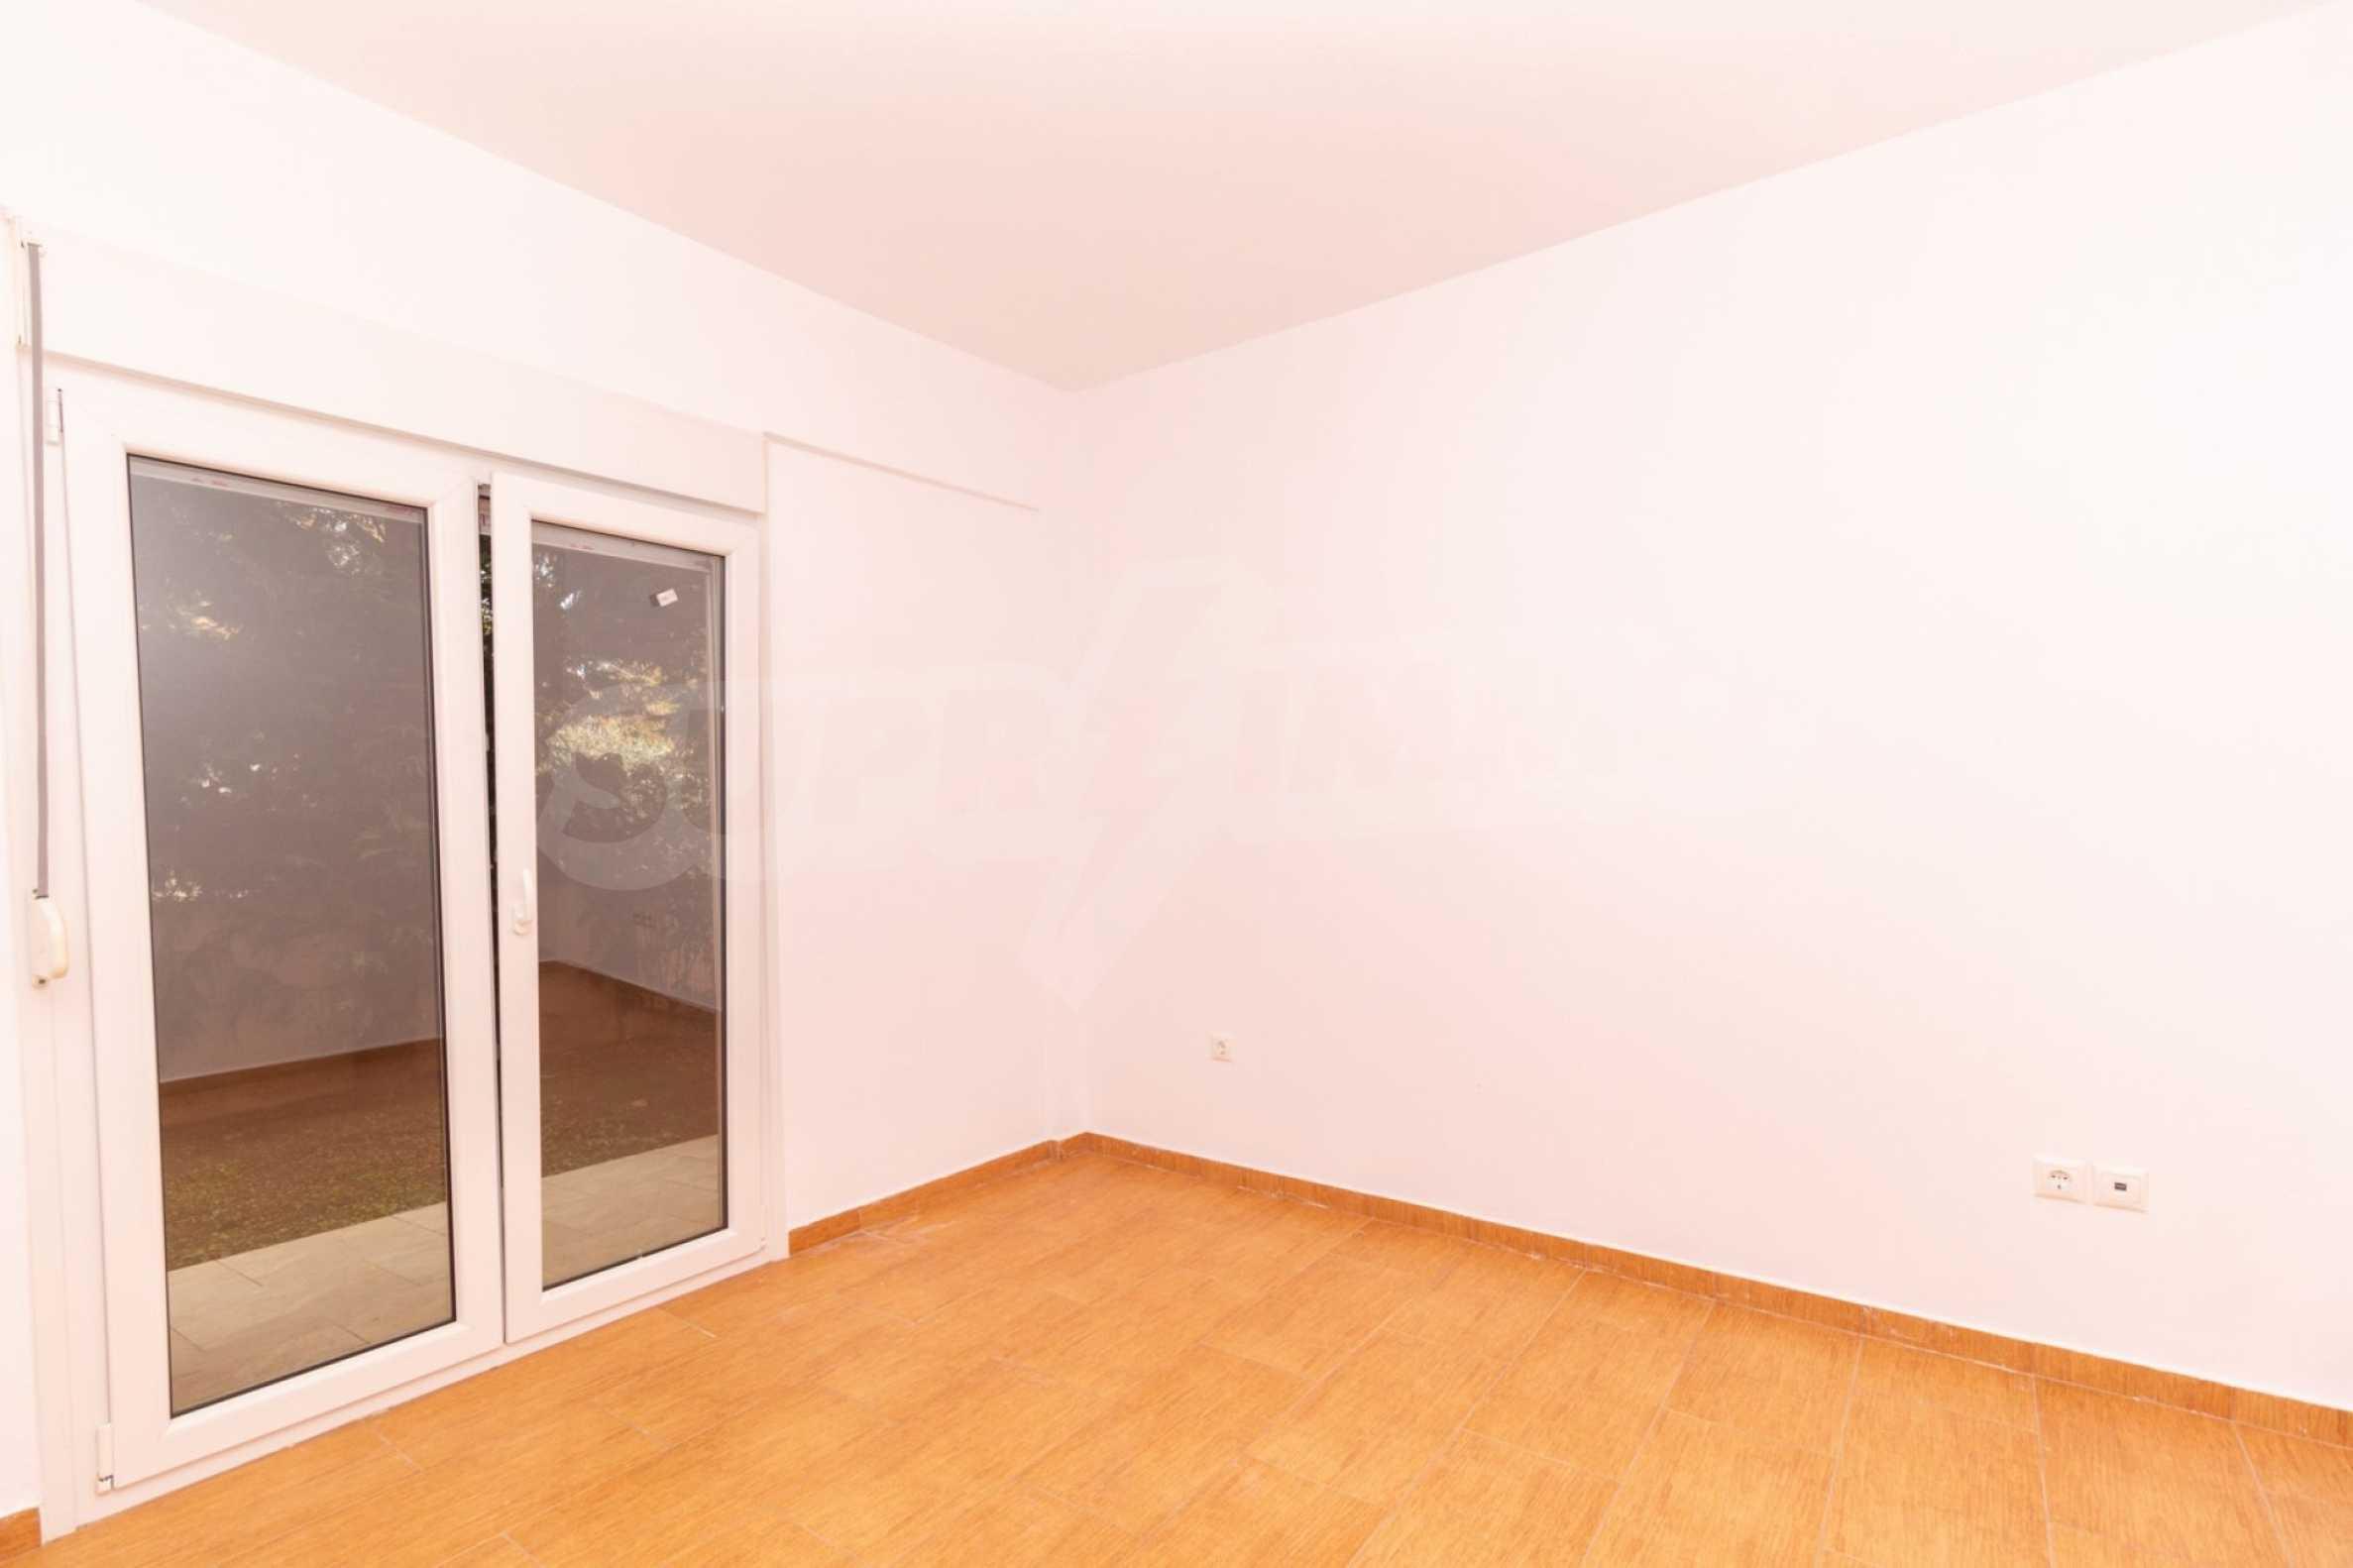 тристаен апартамент в Потидея, Касандра 25